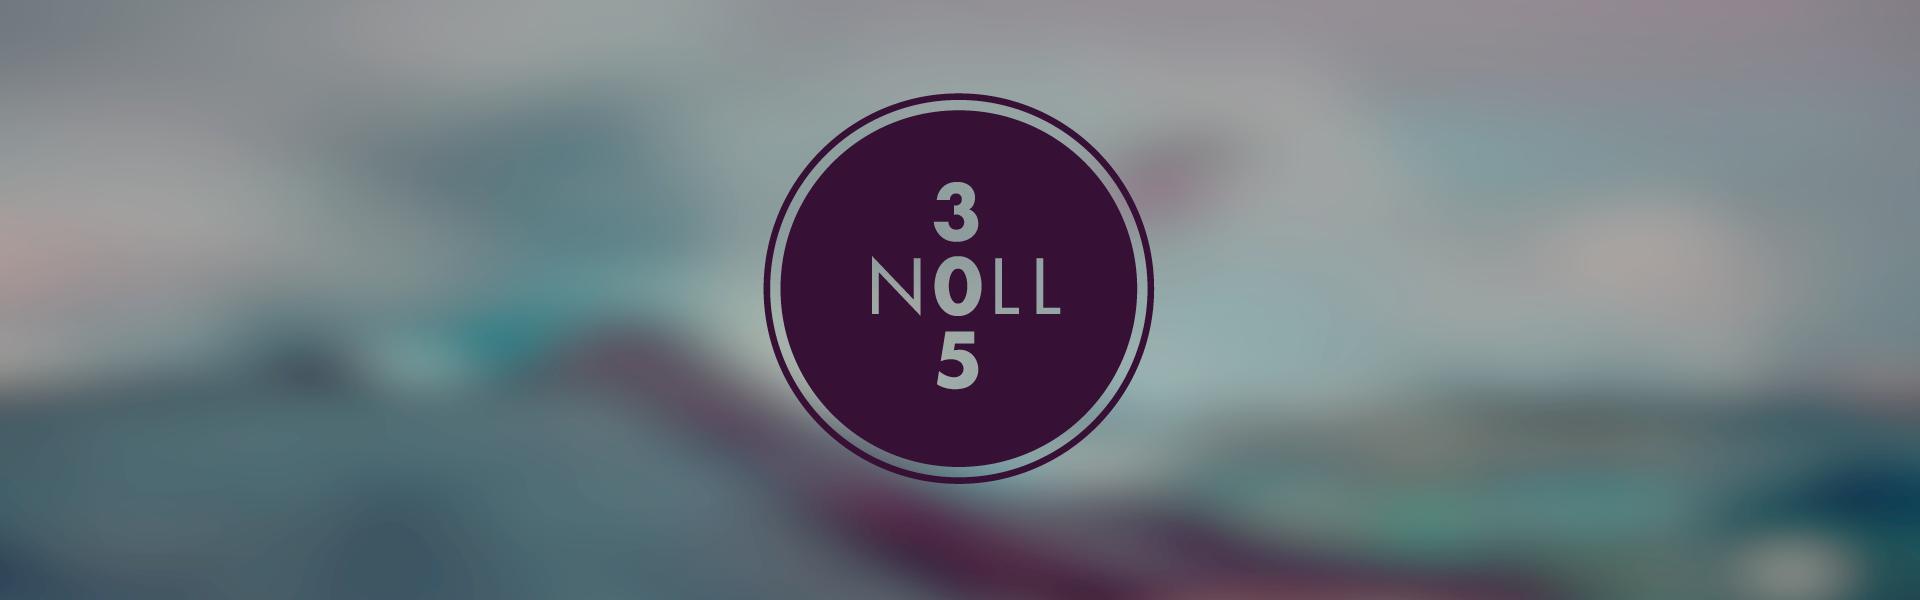 3noll5.se